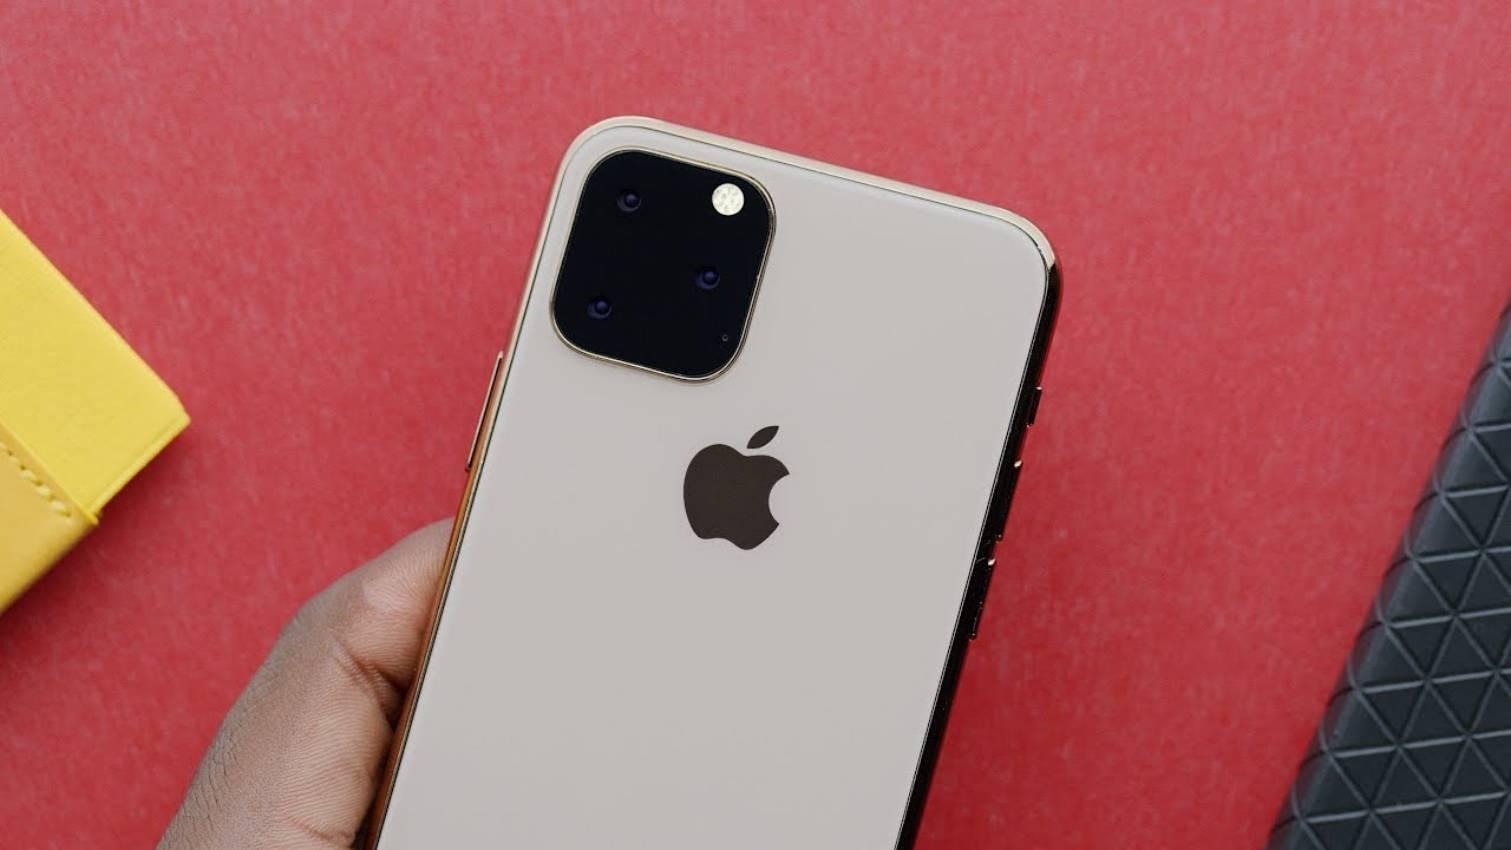 iPhone 11 Iata NOILE Denumiri CIUDATE pentru Telefoanee din 2019